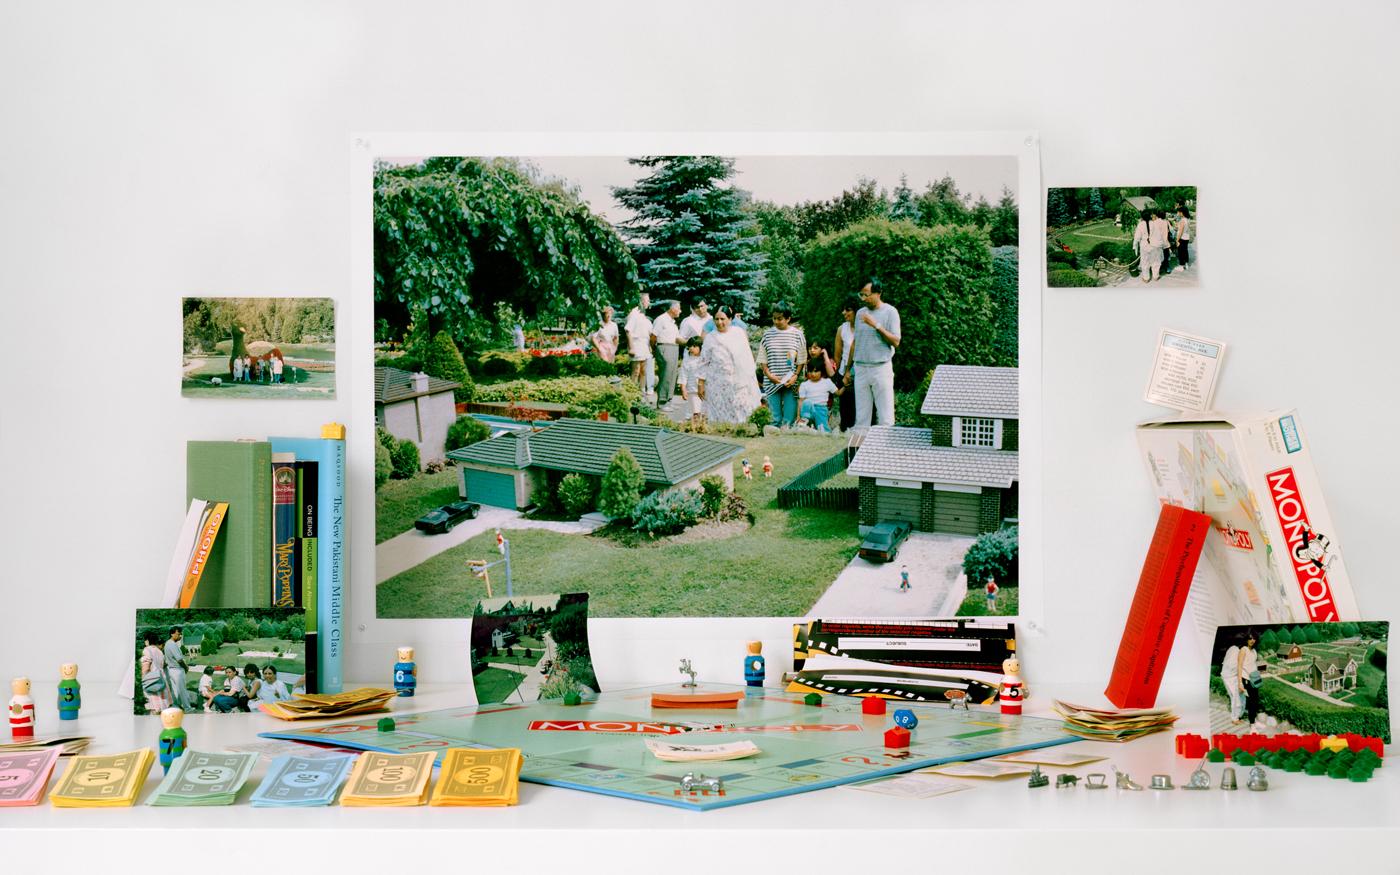 Keep Off the Grass - Cullen Gardens and Miniature Village, 1988 , 2019